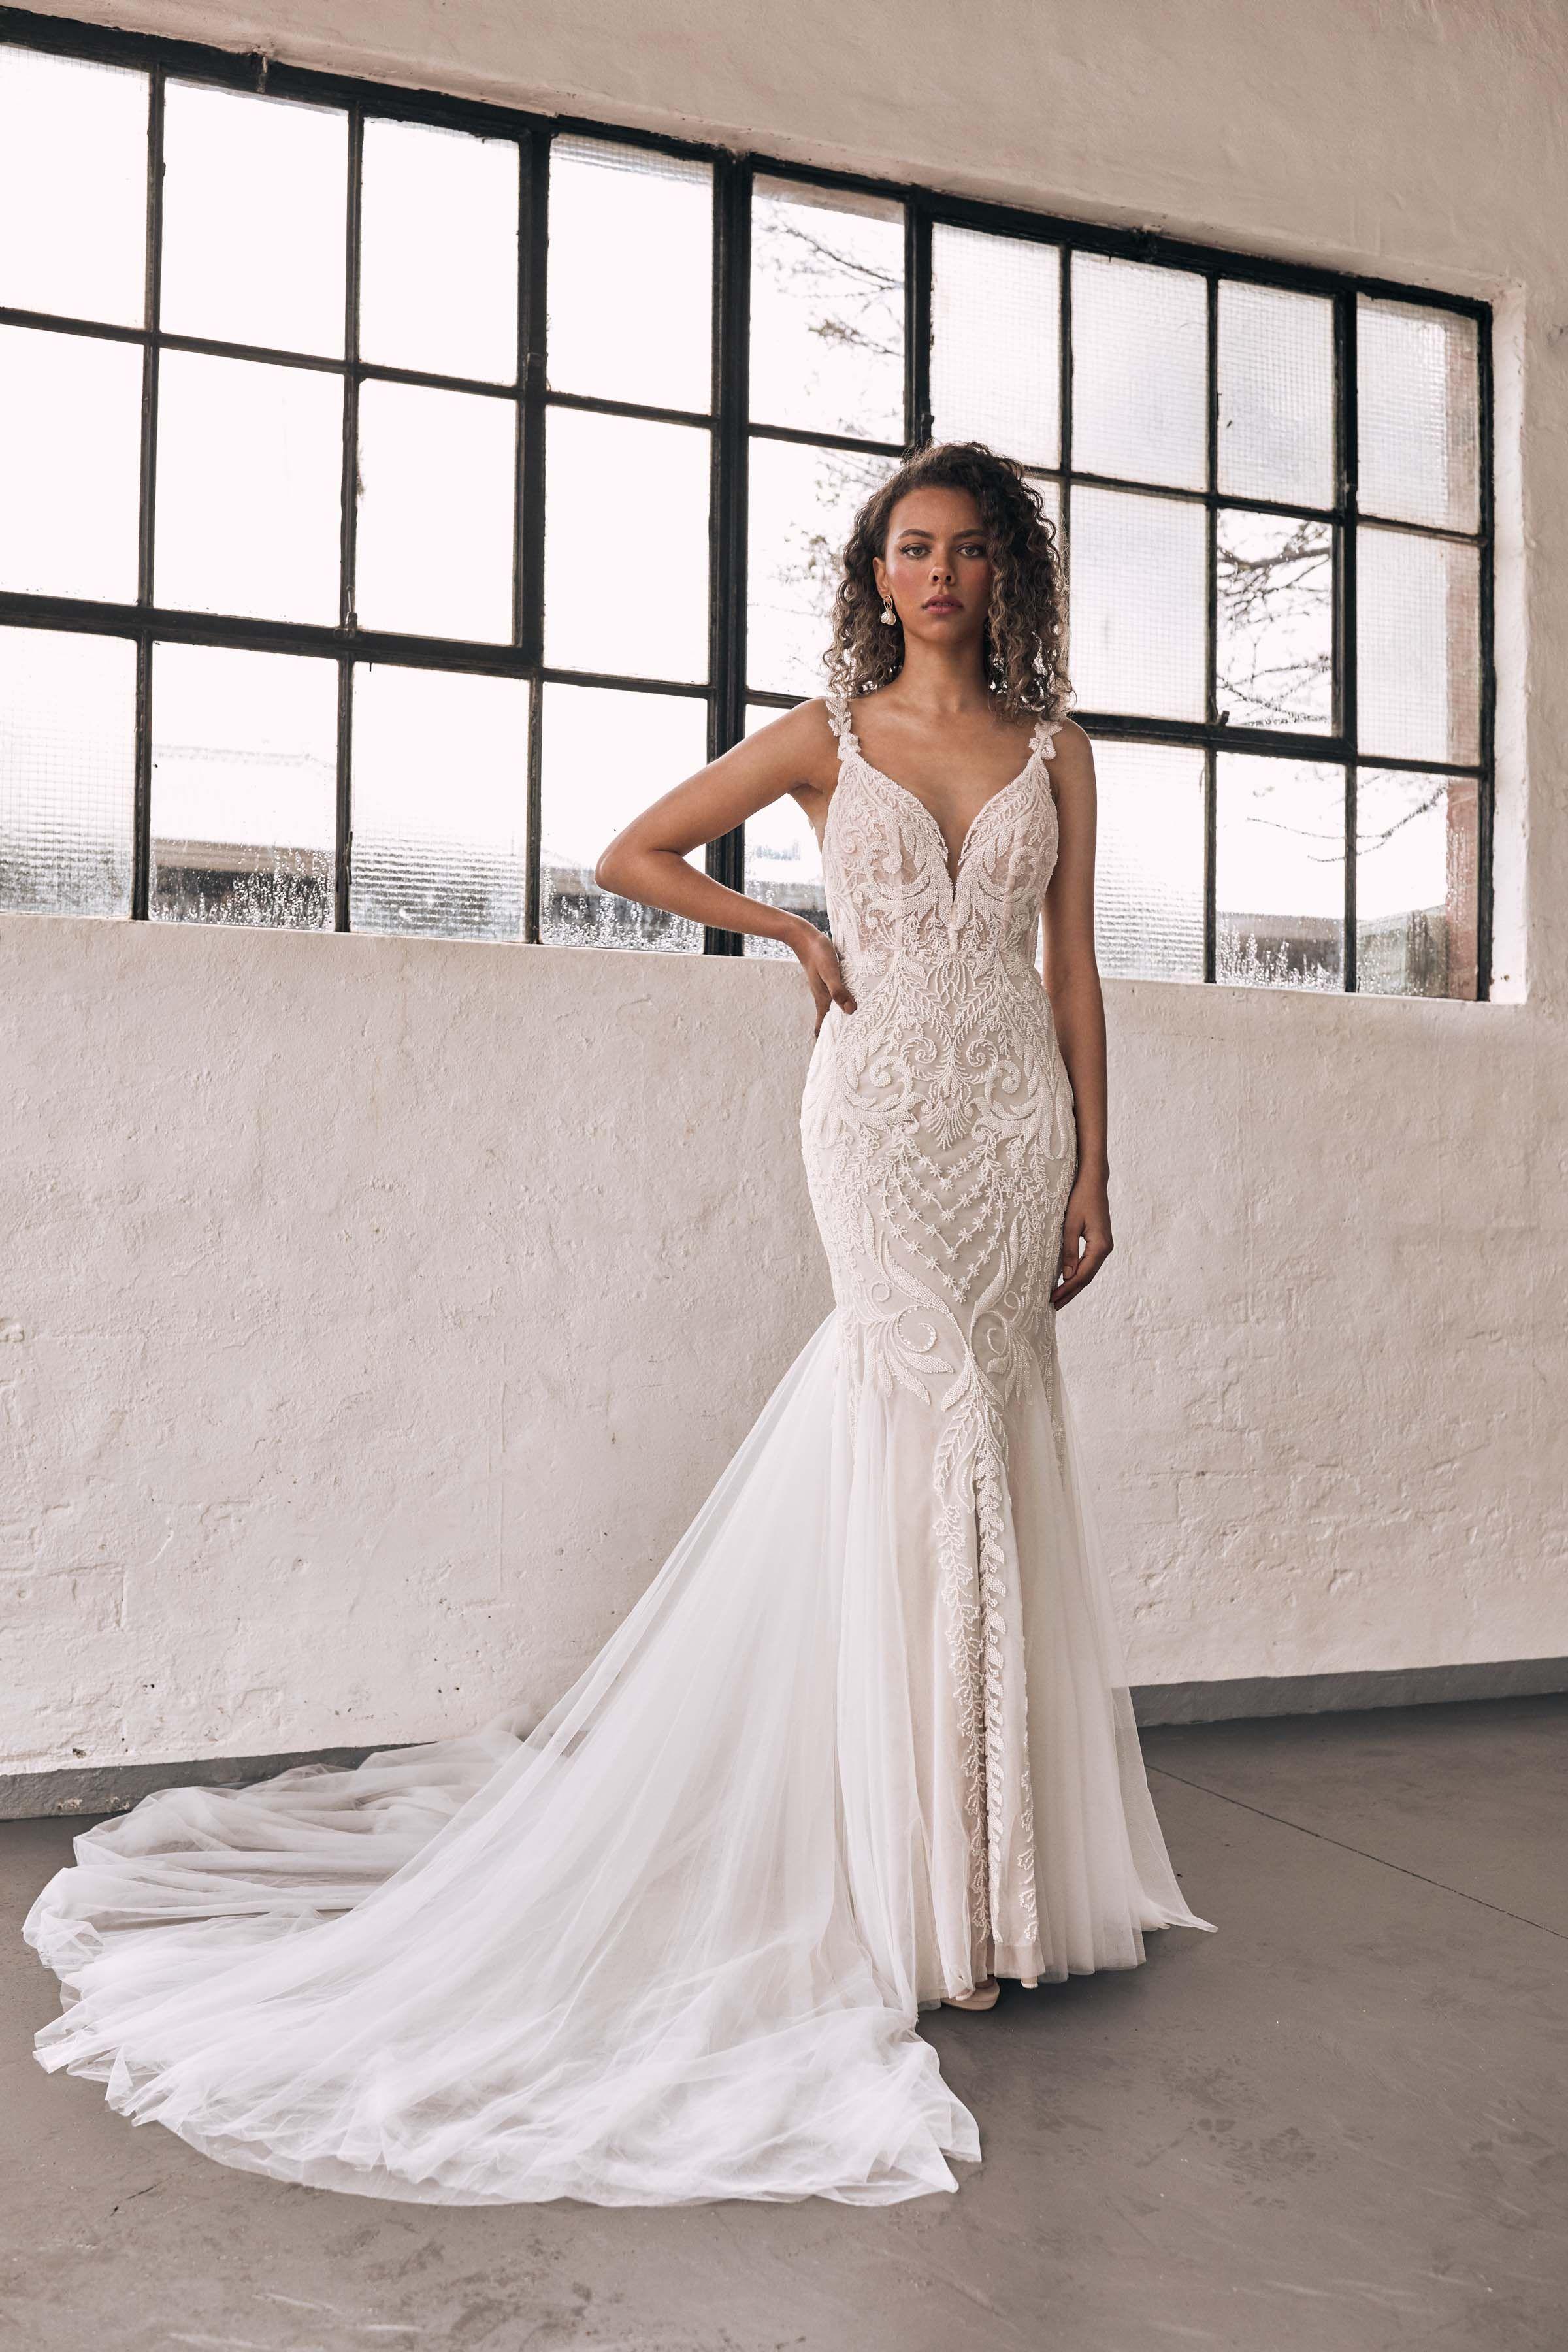 Zc 359 Online Wedding Dress Wedding Dress Shopping Wedding Dresses